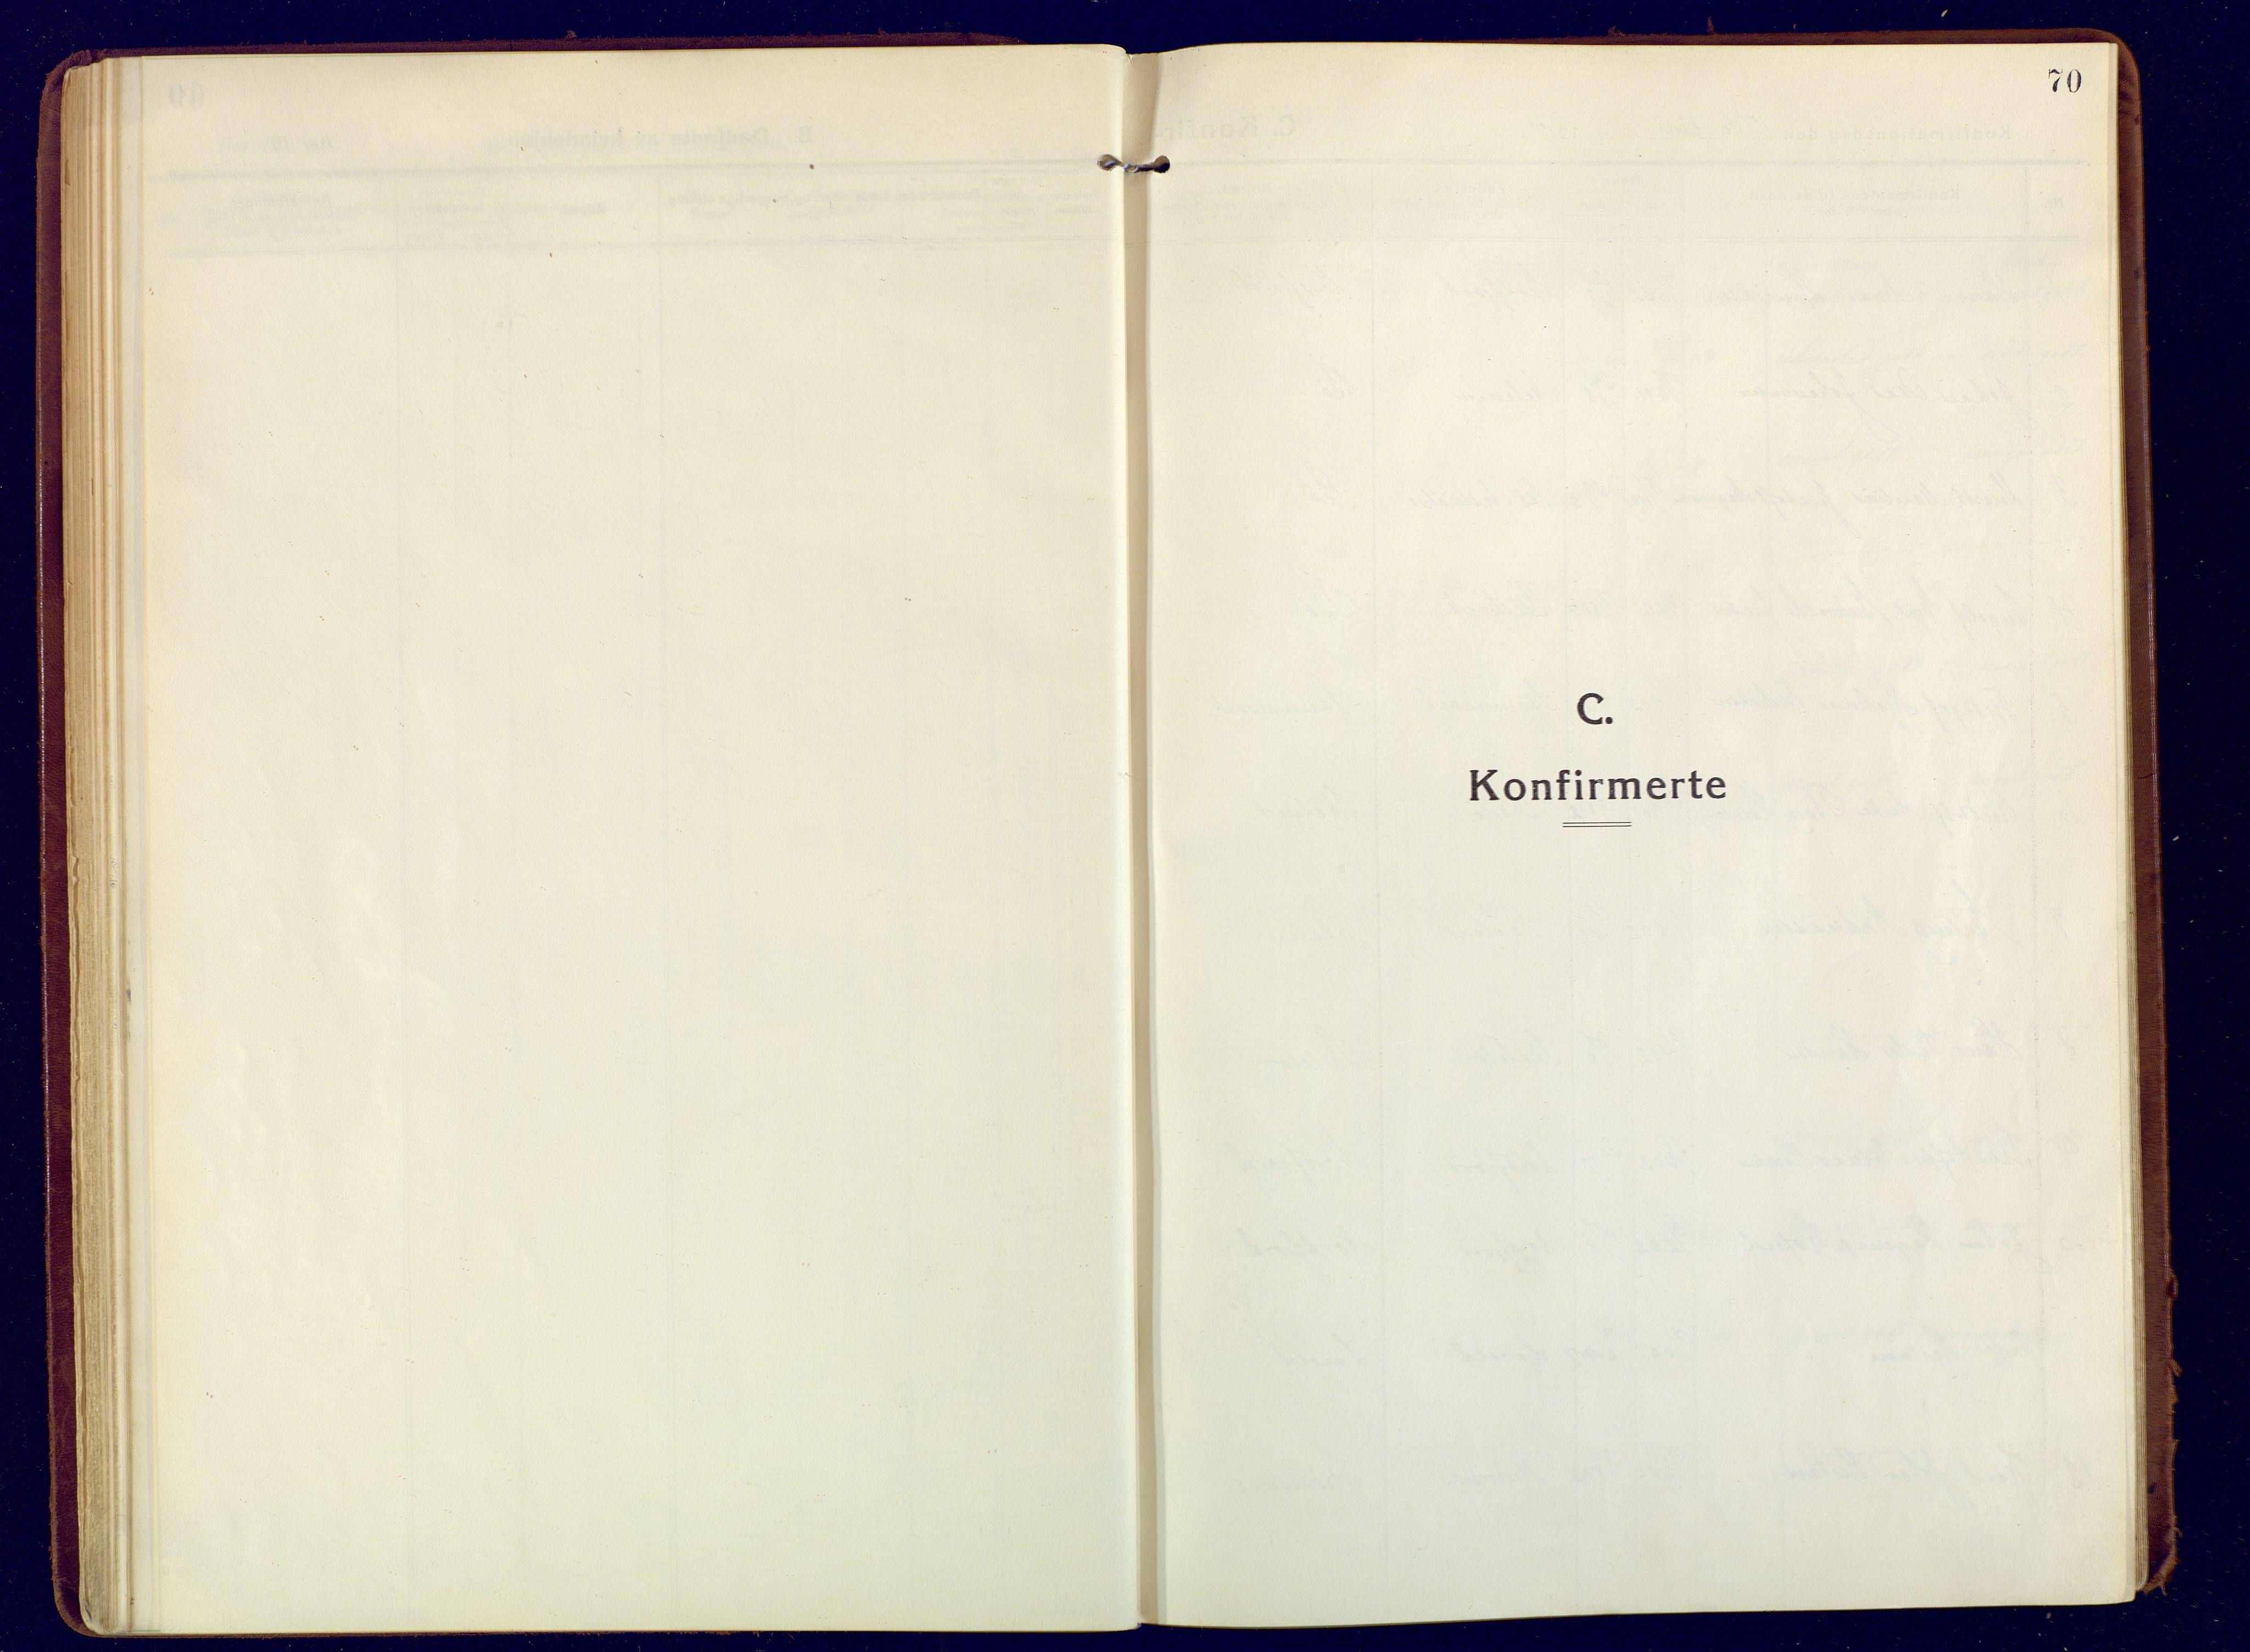 SATØ, Mefjord/Berg sokneprestkontor, G/Ga/Gaa: Ministerialbok nr. 9, 1916-1928, s. 70